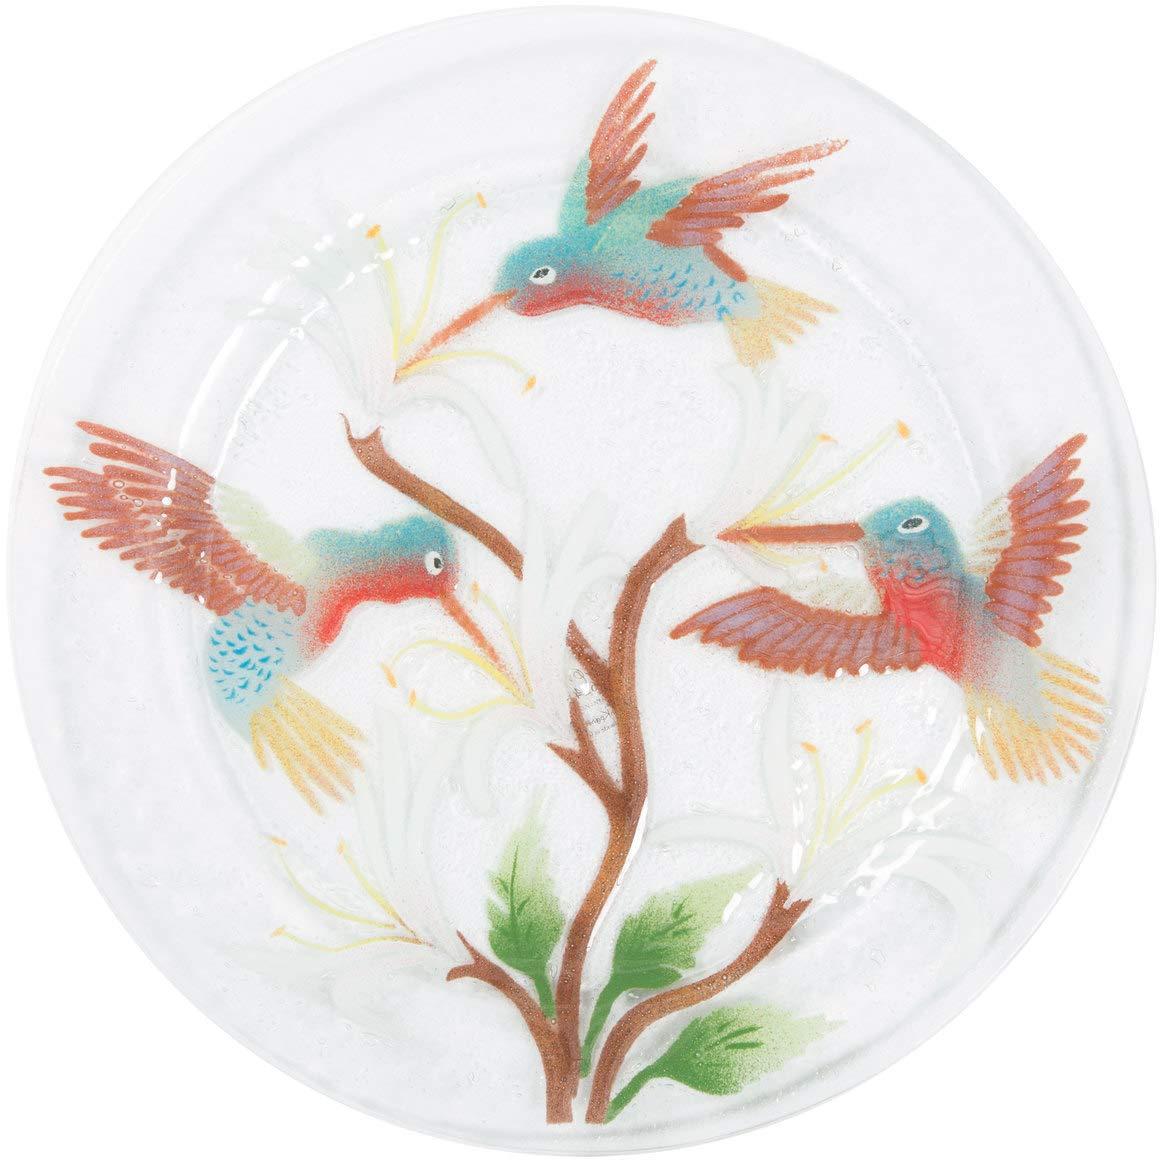 Hummingbird 11 Round Serving Plate Pavilion Gift Company 56241 Pavilion